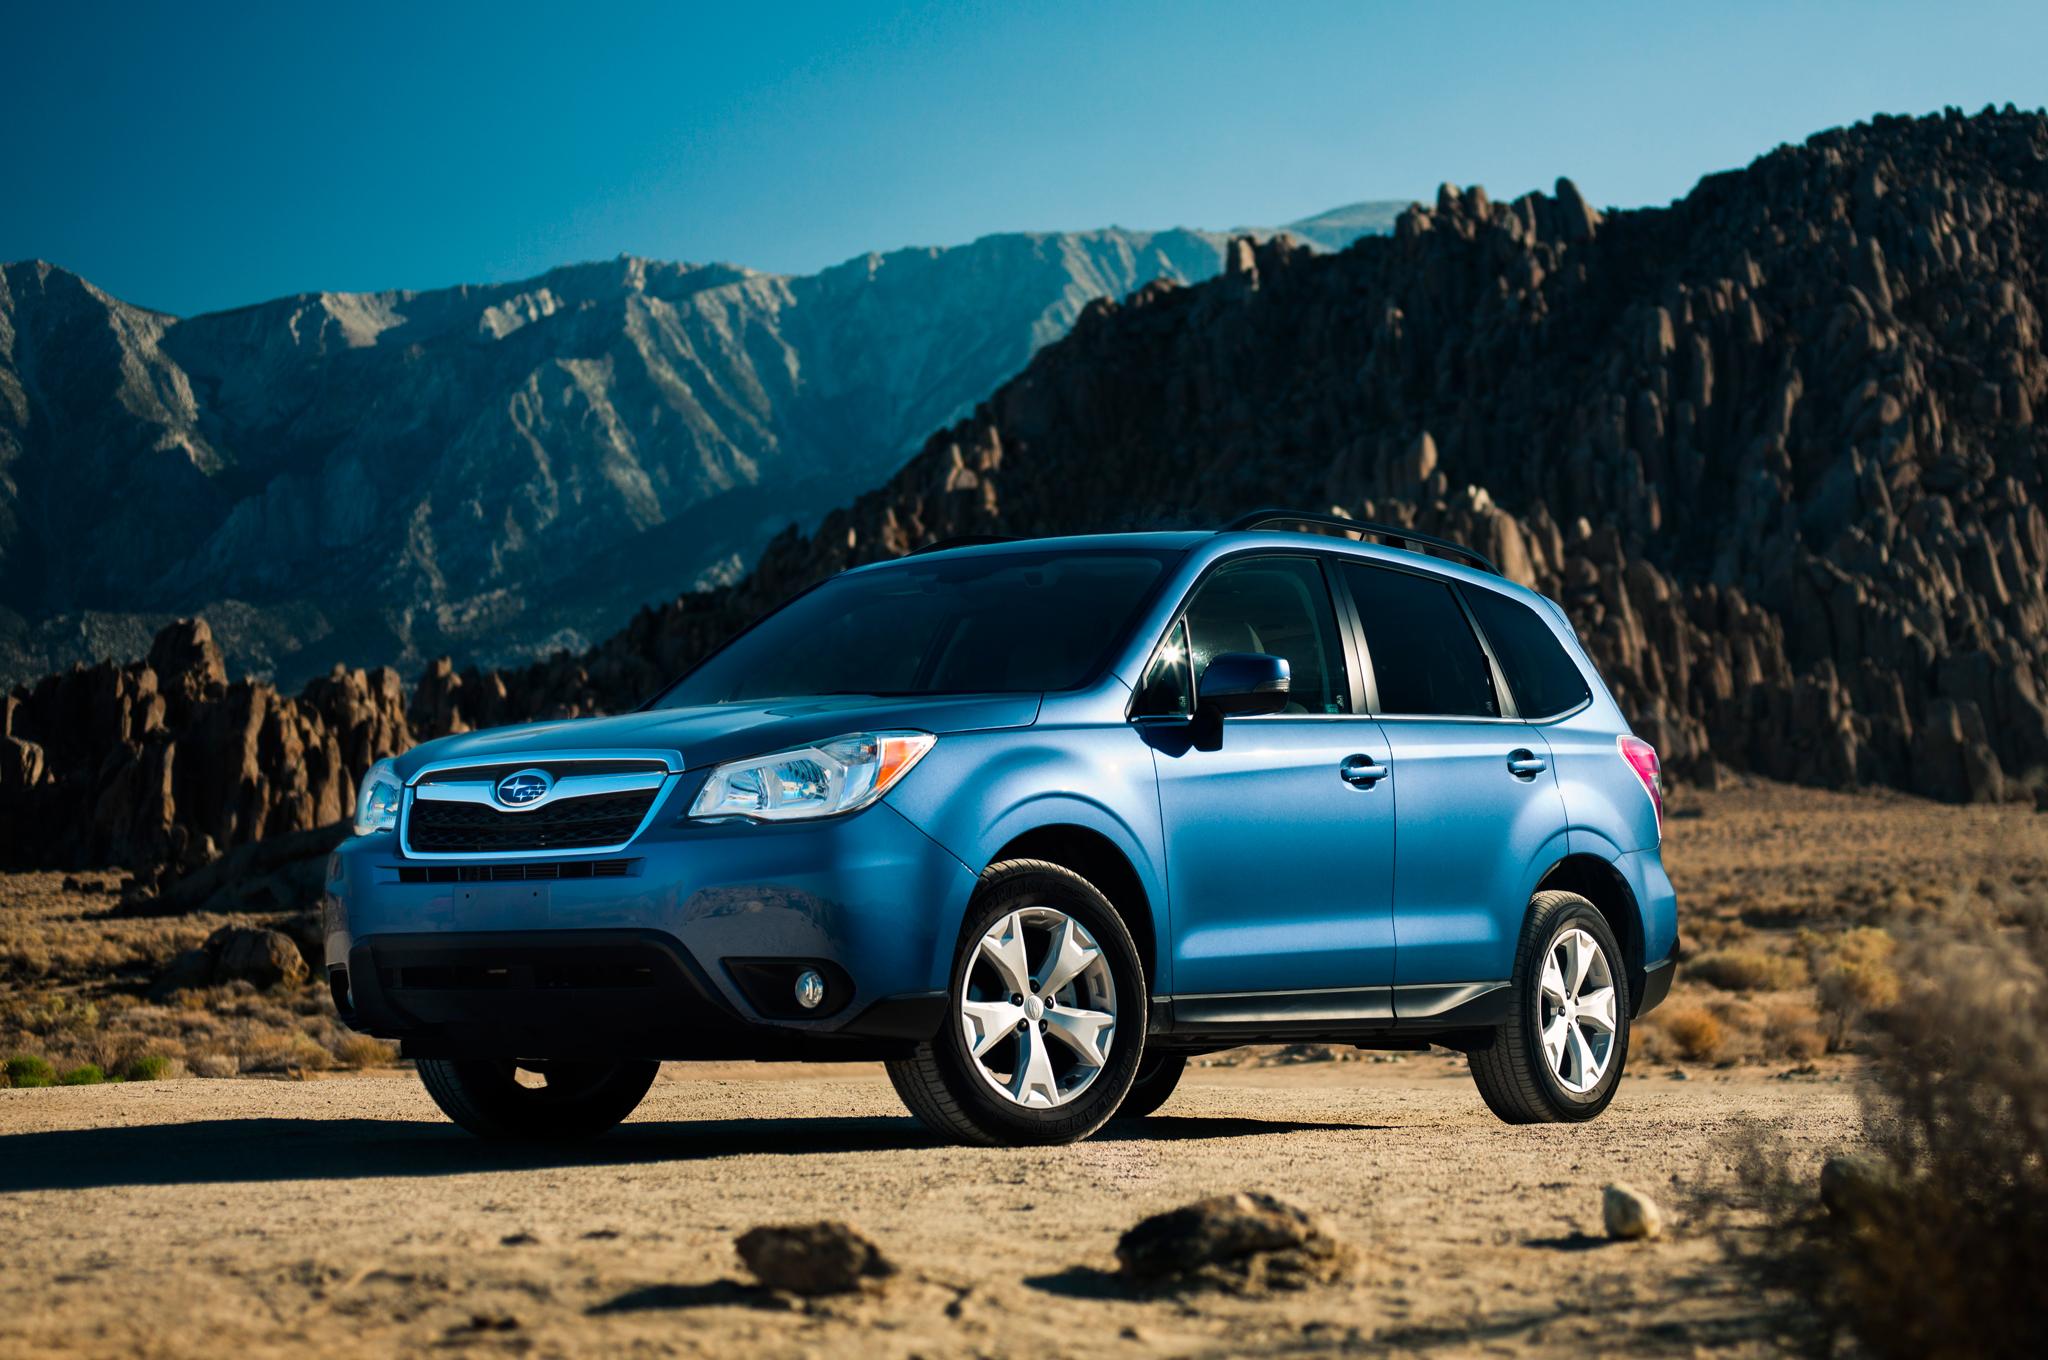 2014-Subaru-Forester-front-three-quarter-02